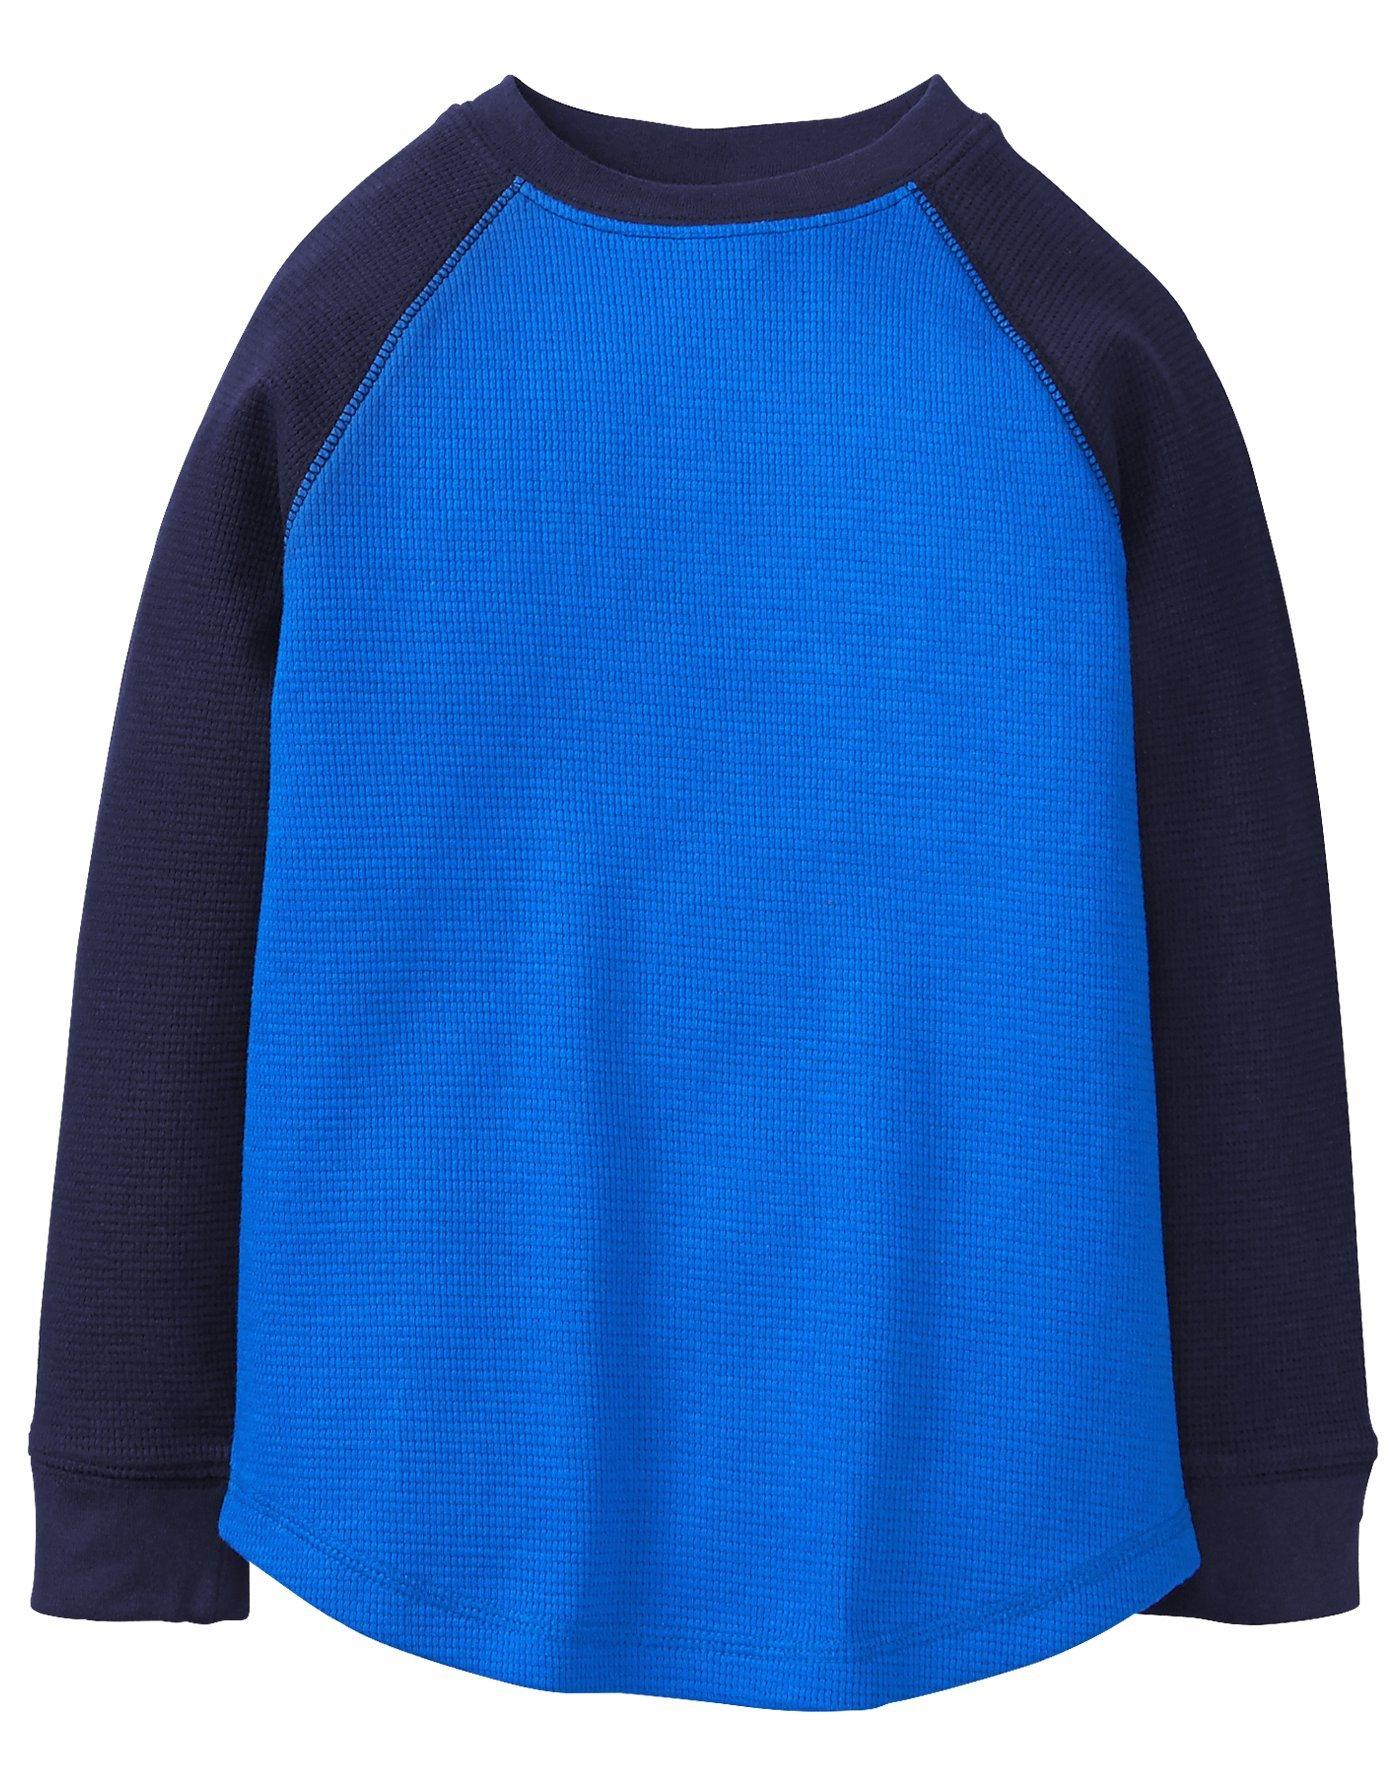 Gymboree Little Boys' Long Sleeve Tee Colorblock Waffle, Blue Color Block, M